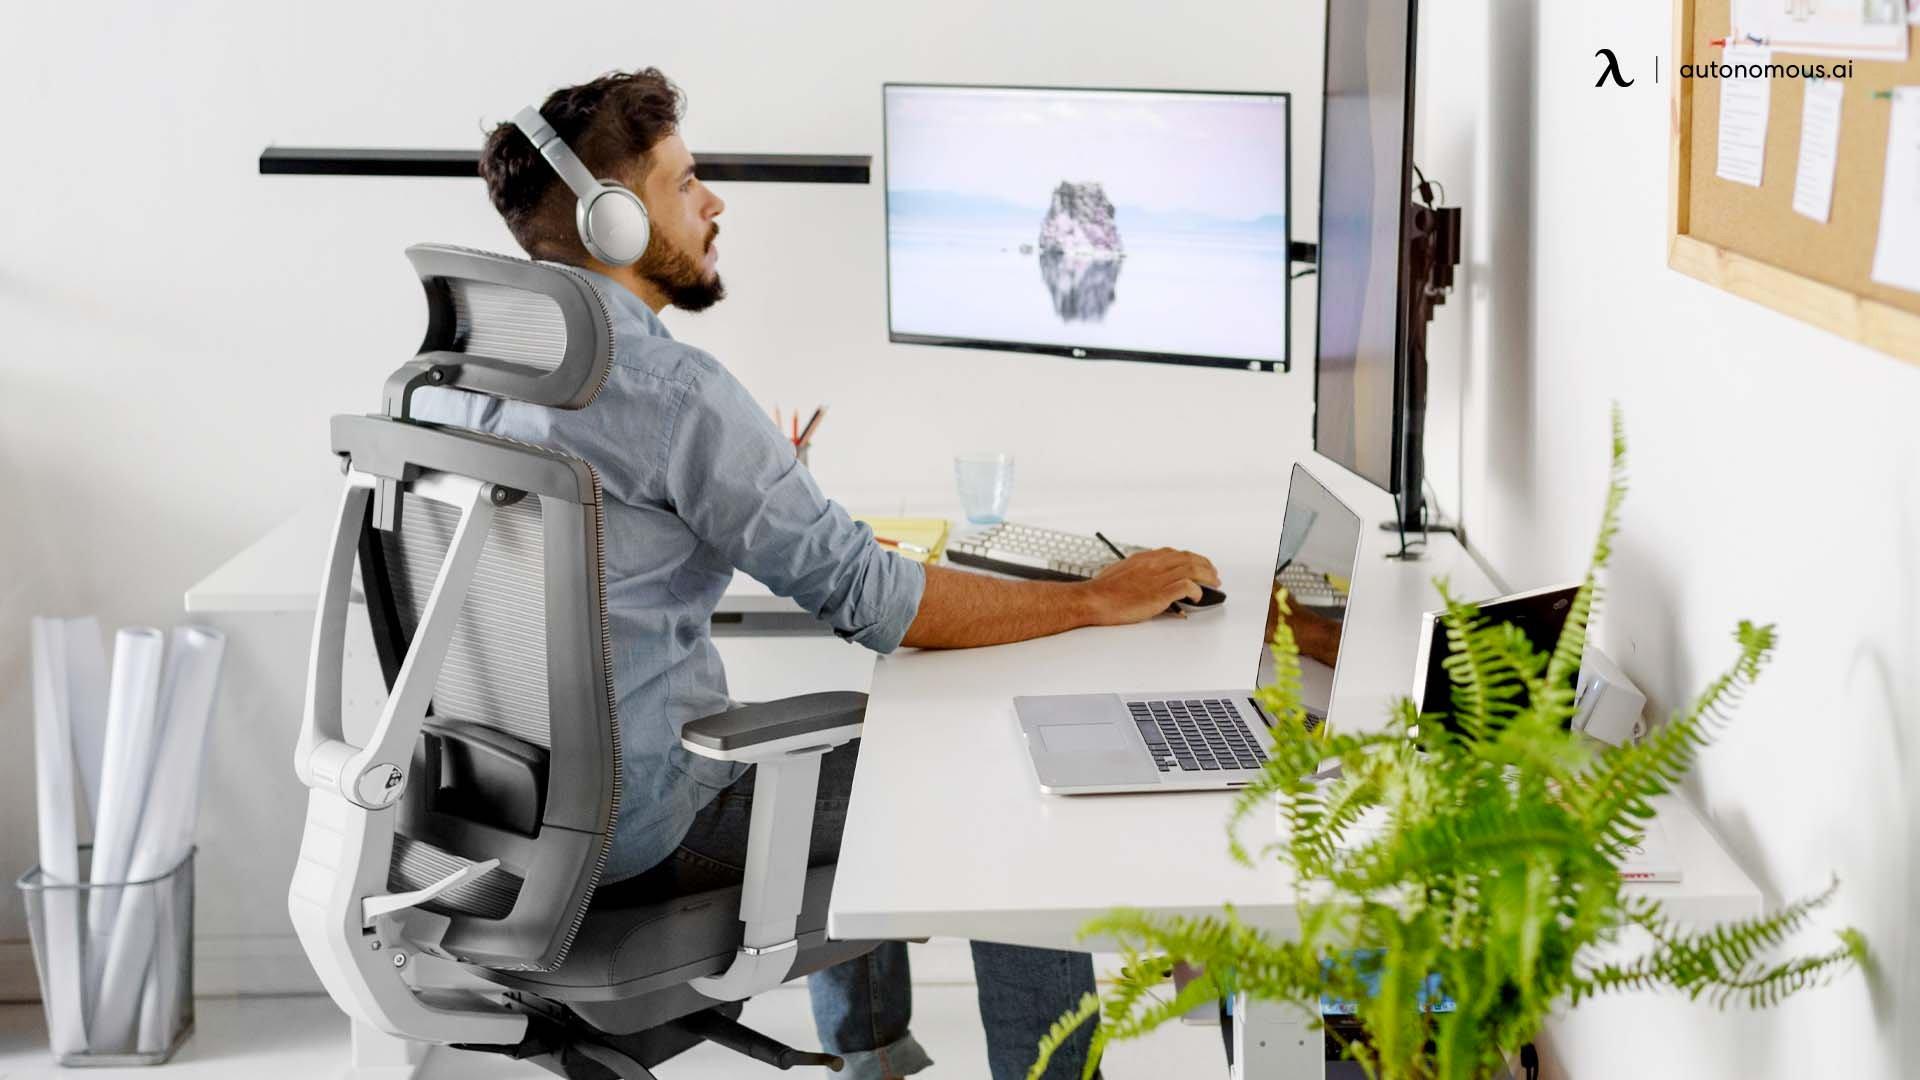 Improve the Ergonomics of Your Workspace